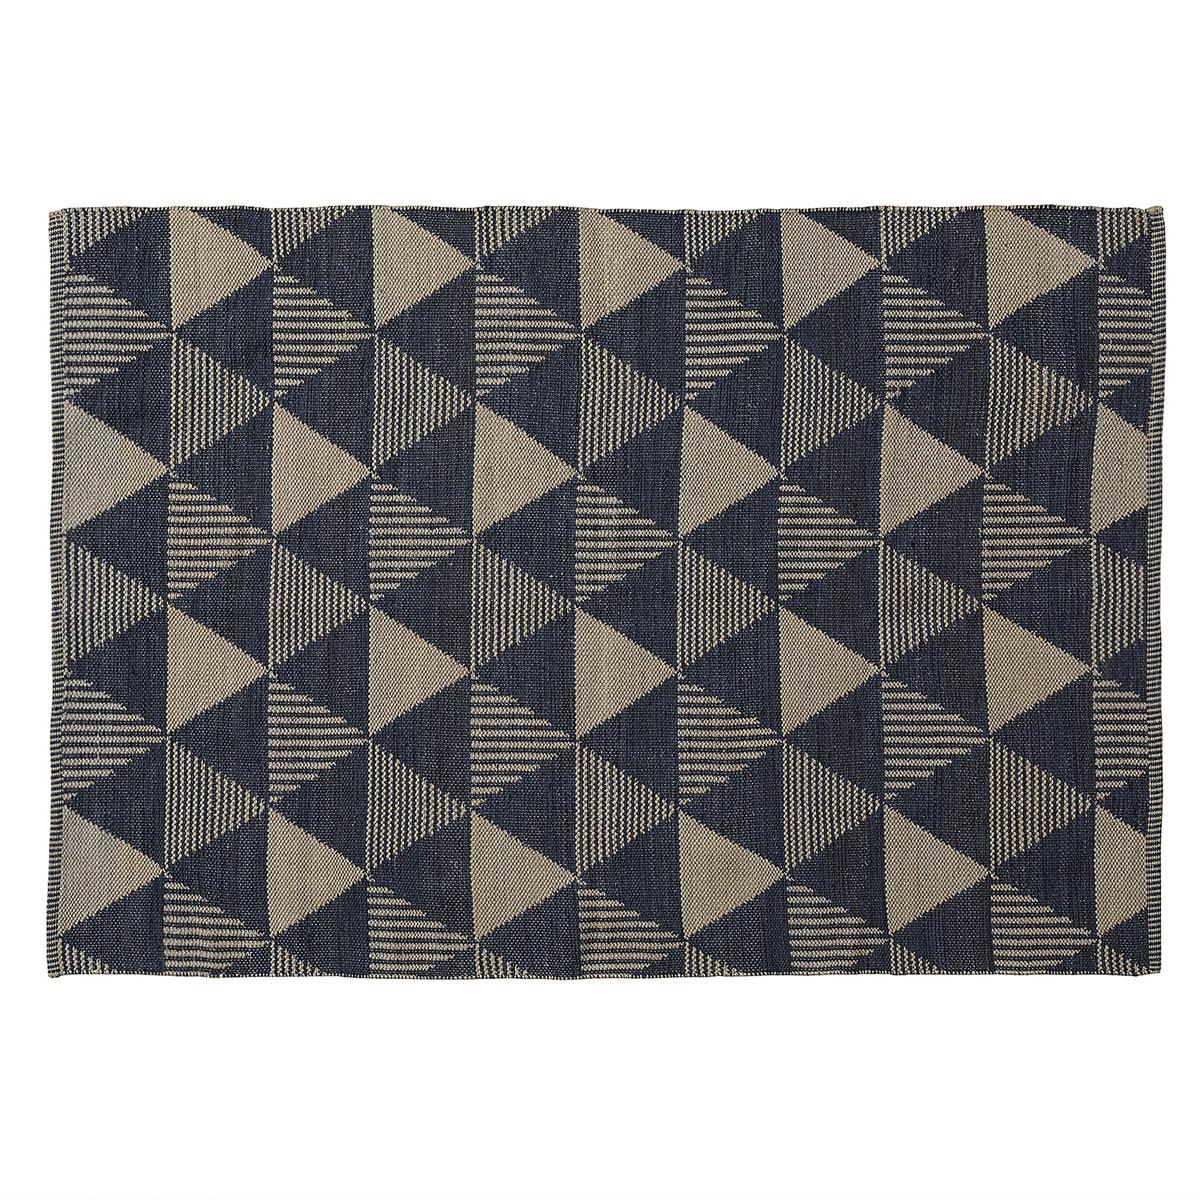 Tapis aux motifs bicolore - Bleu - 130 x 190 cm